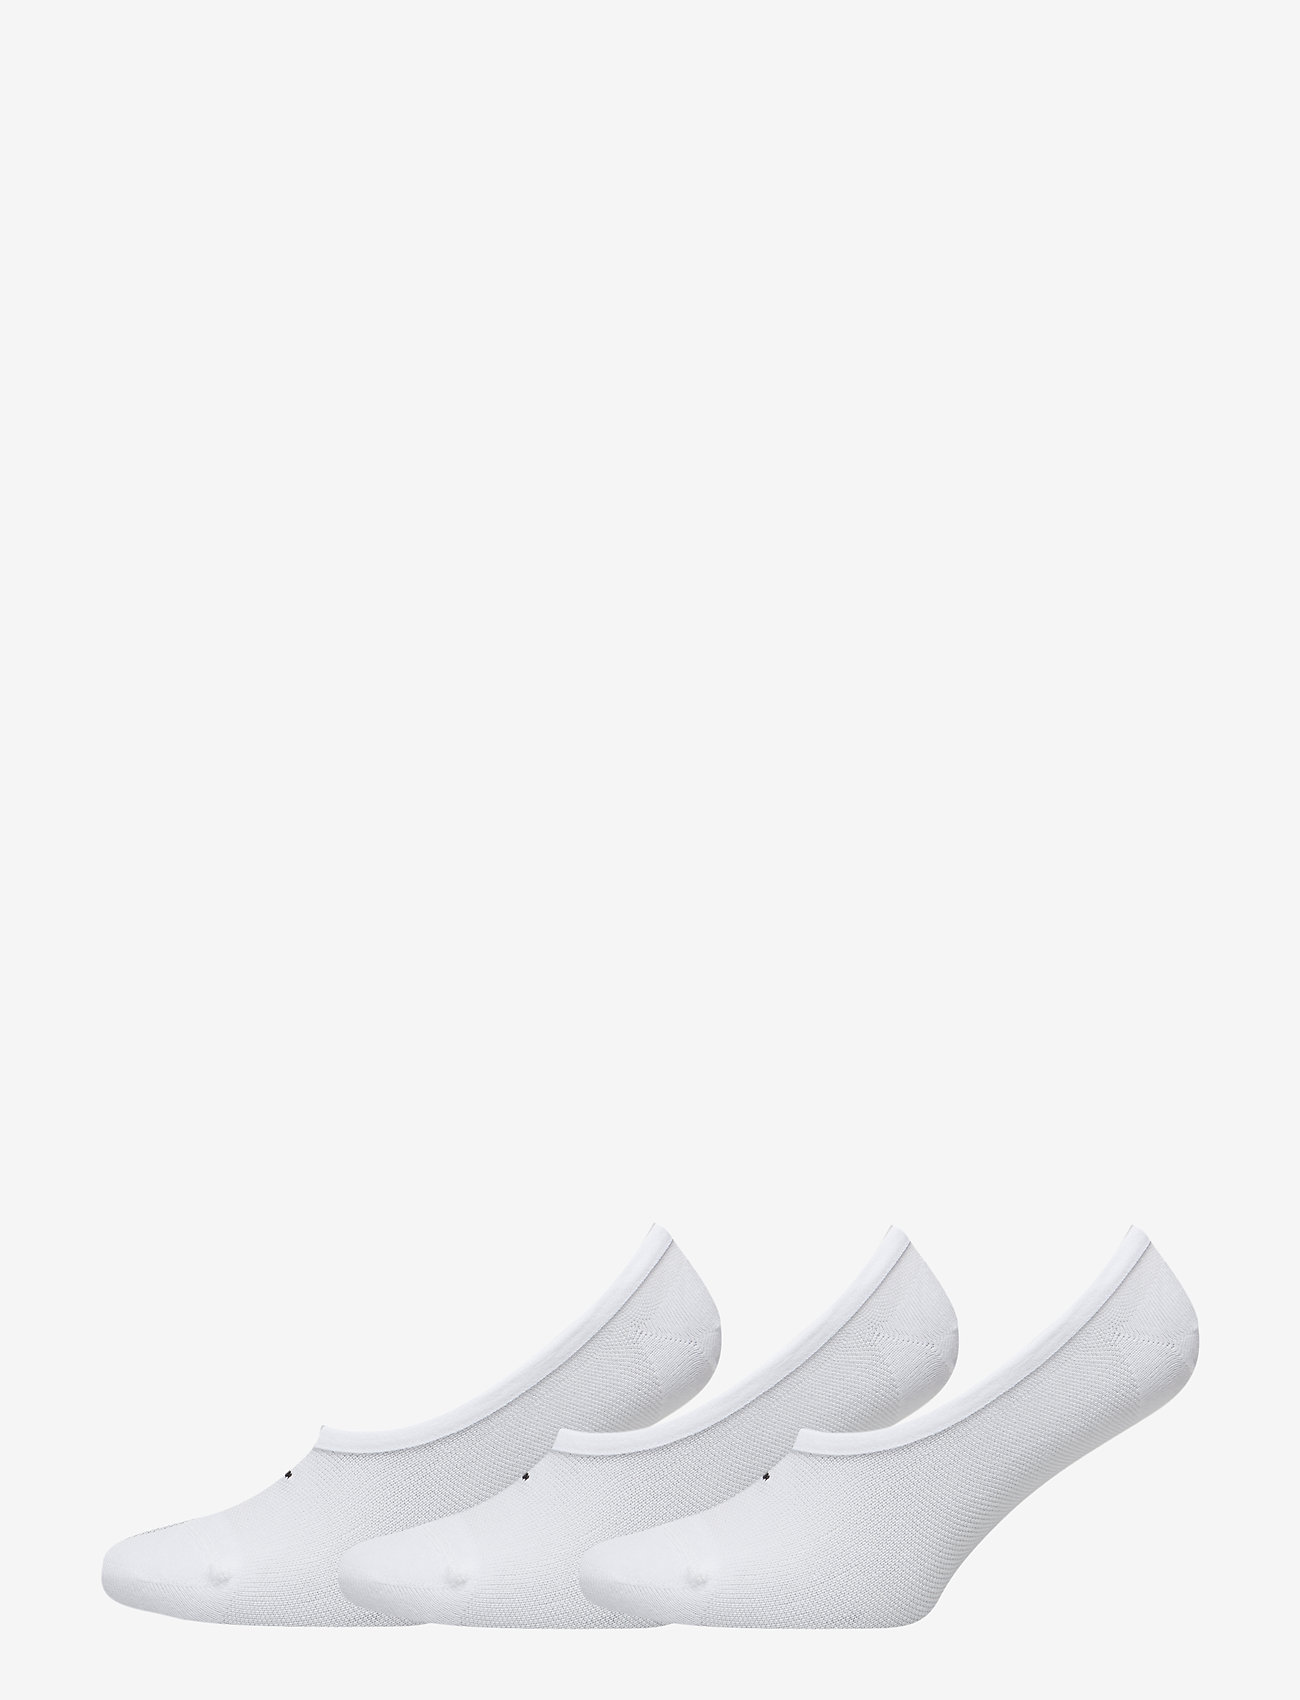 PUMA - PUMA FOOTIE 3P UNISEX - kousen - white - 0